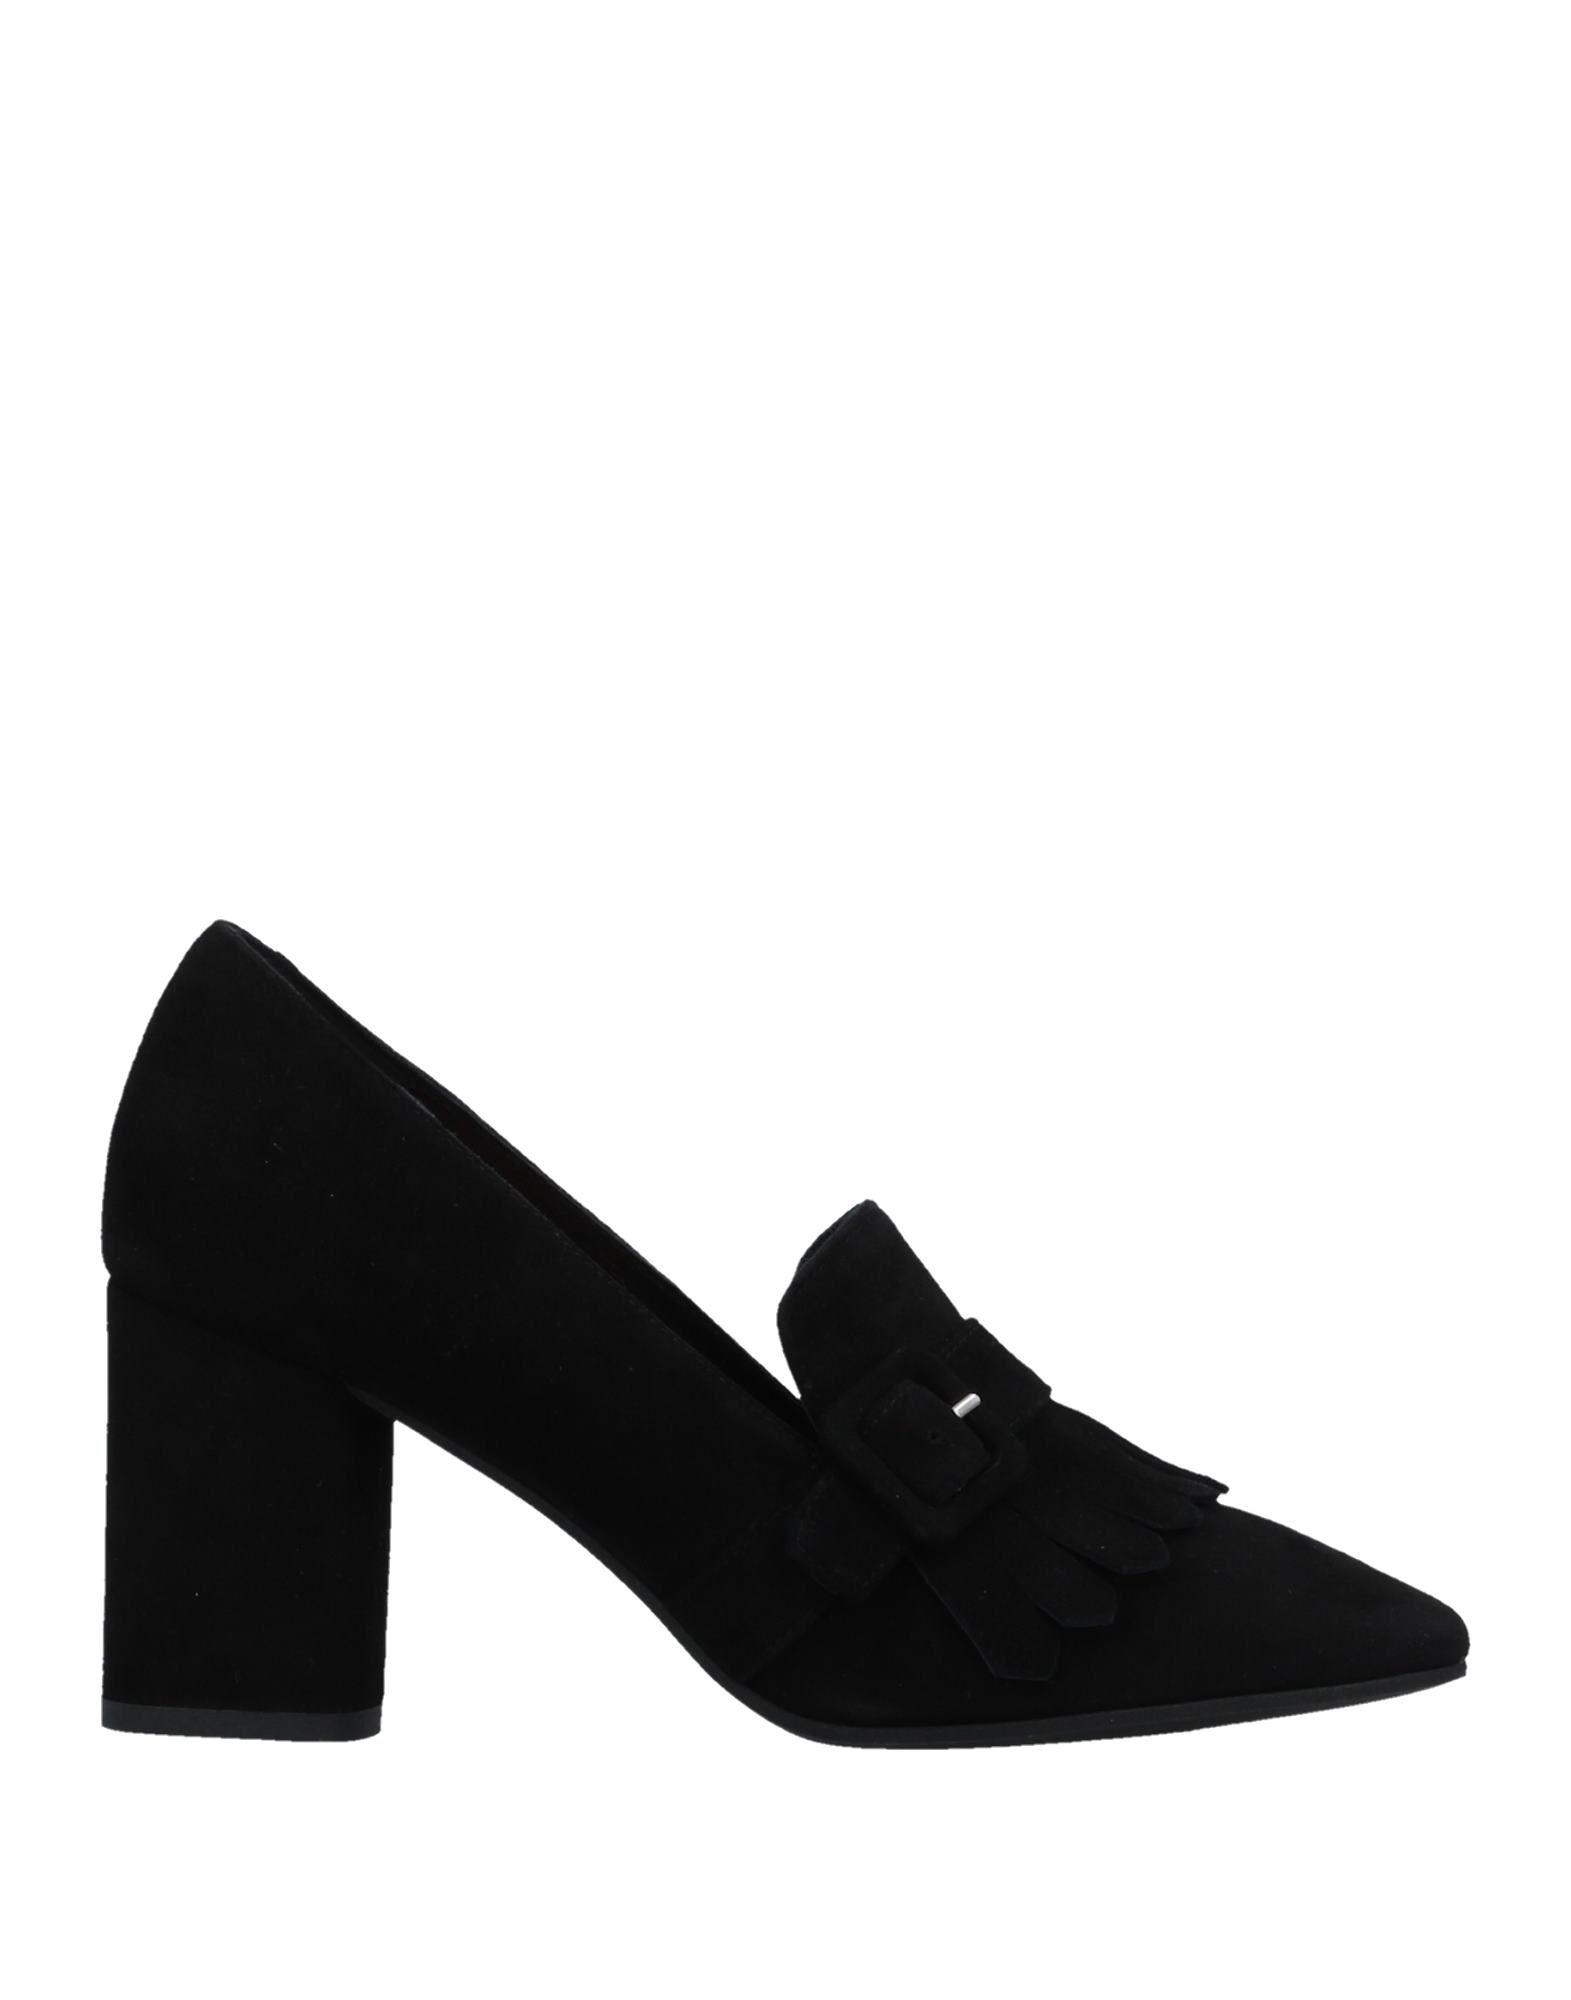 Osvaldo Rossi Rossi Osvaldo Mokassins Damen  11501986TV Gute Qualität beliebte Schuhe 1c8ace